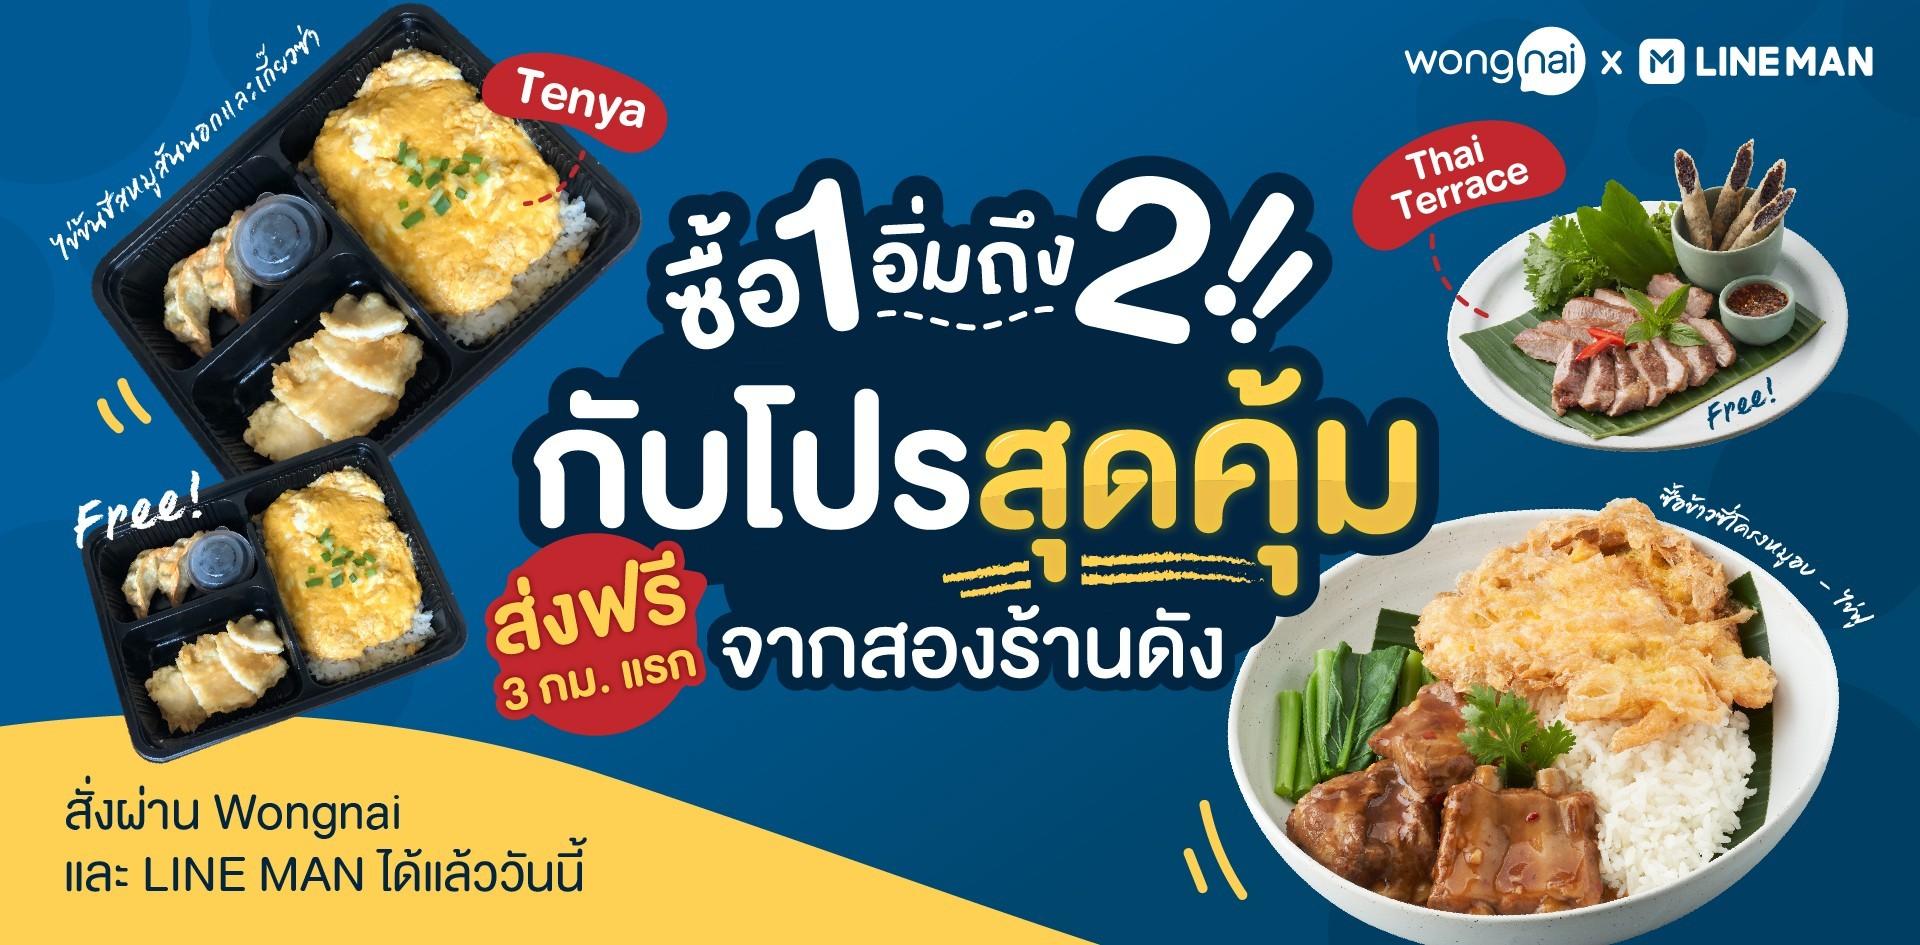 Thai Terrace & Tenya